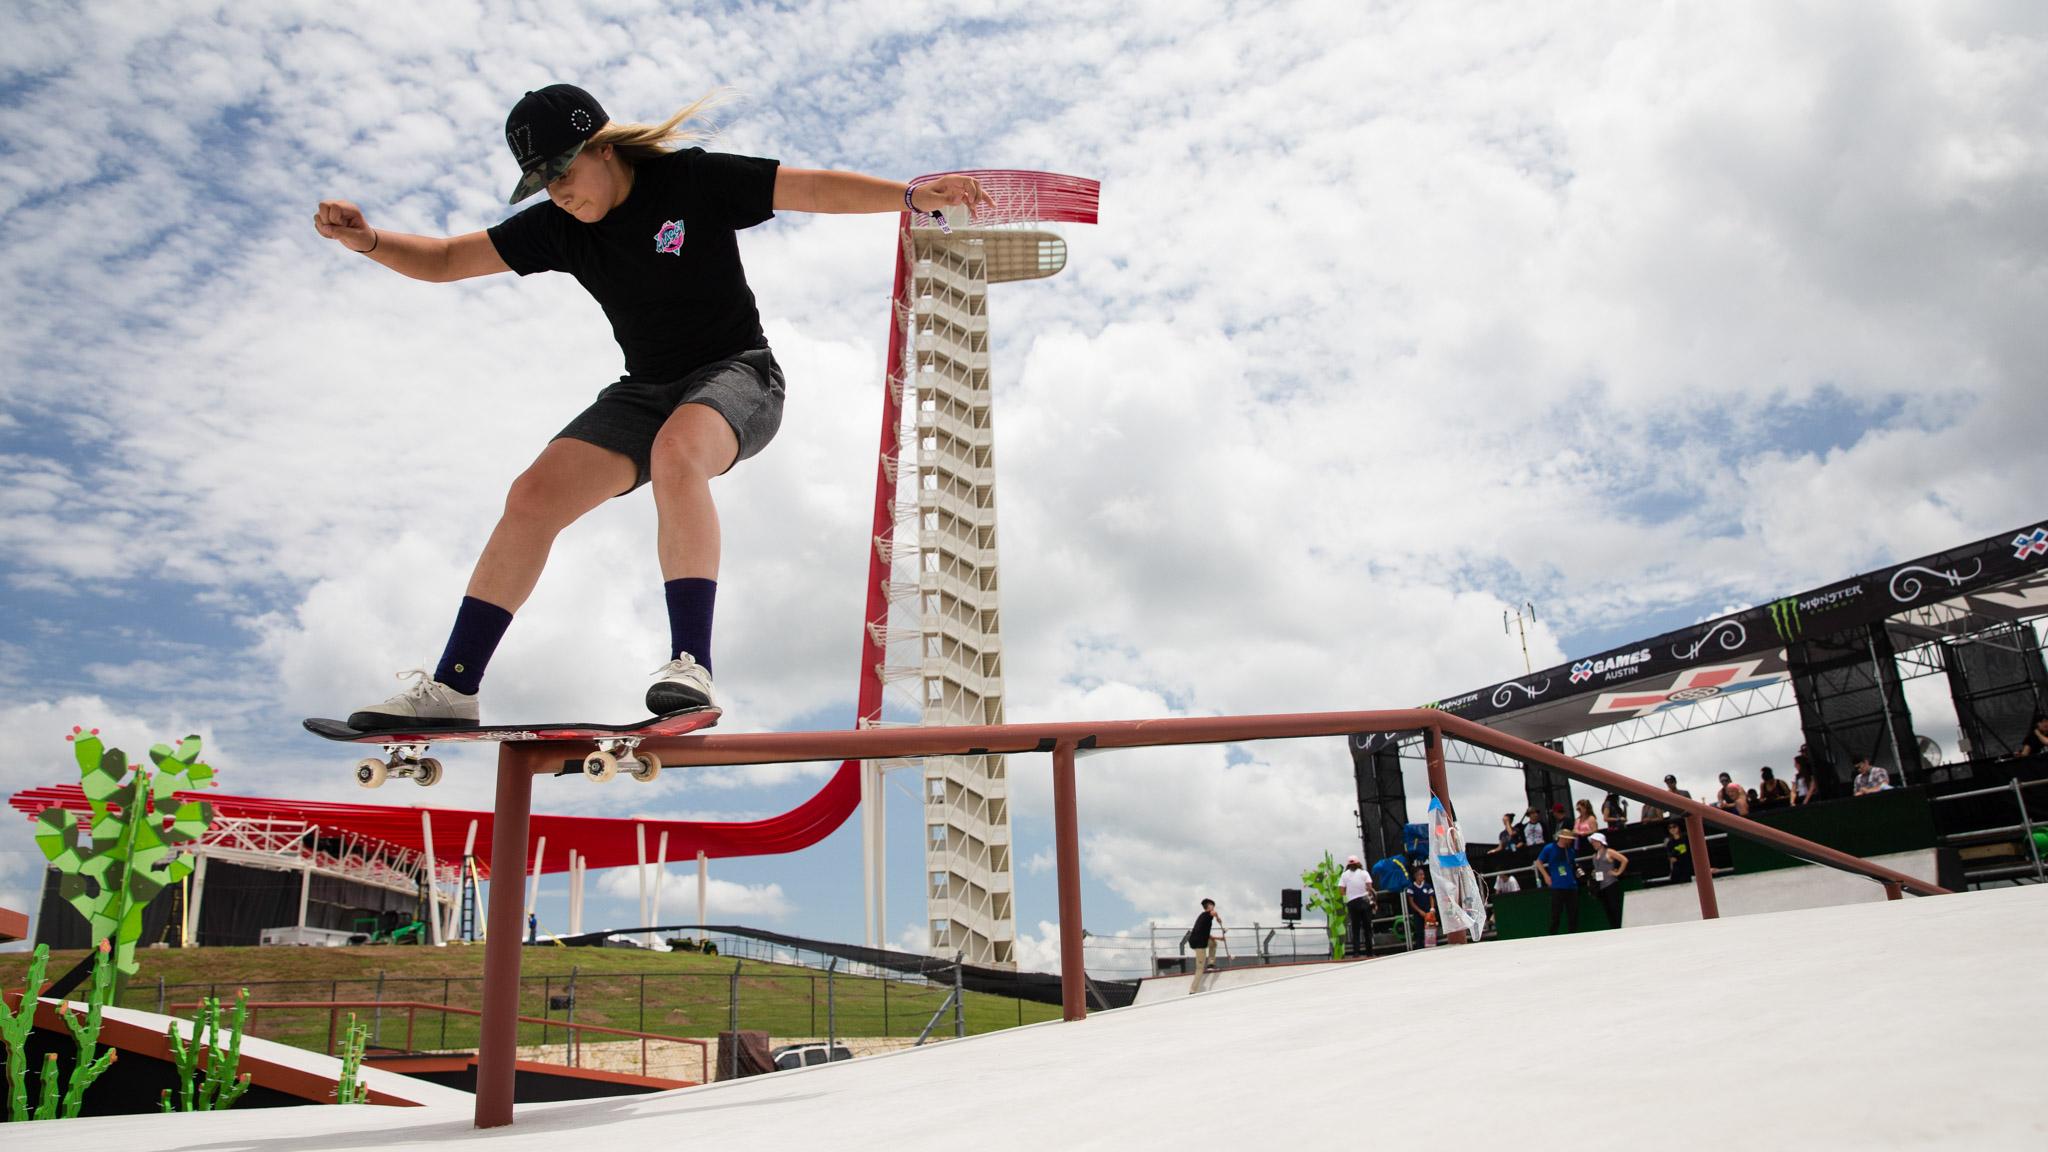 Skateboarding: Alana Smith